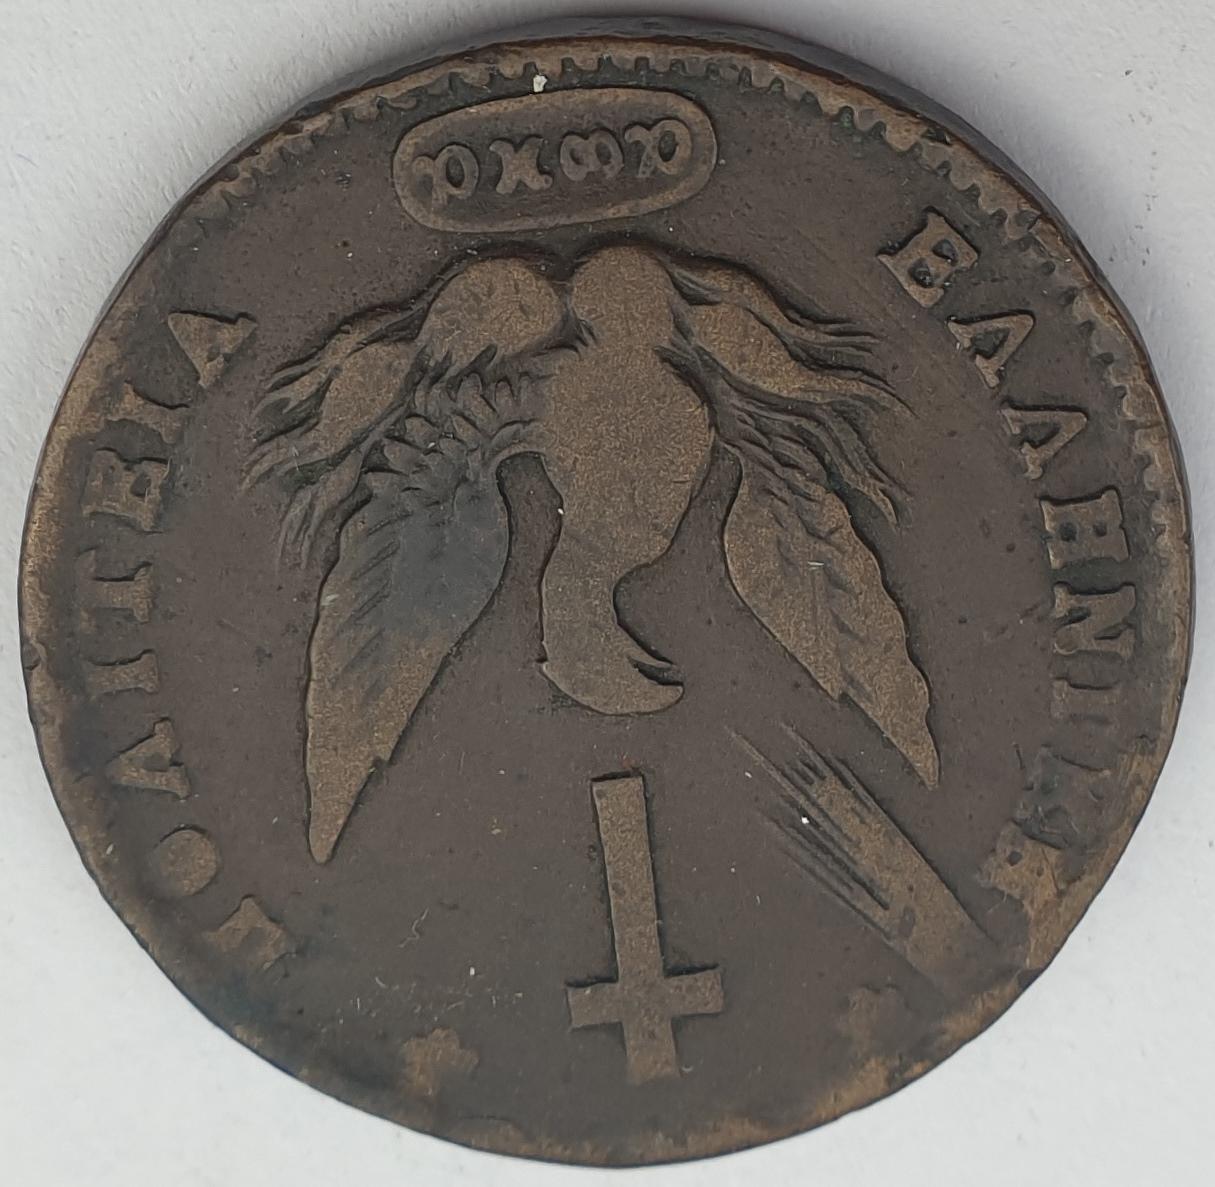 Greece - 10 Lepta 1831, Ioannis Kapodistrias